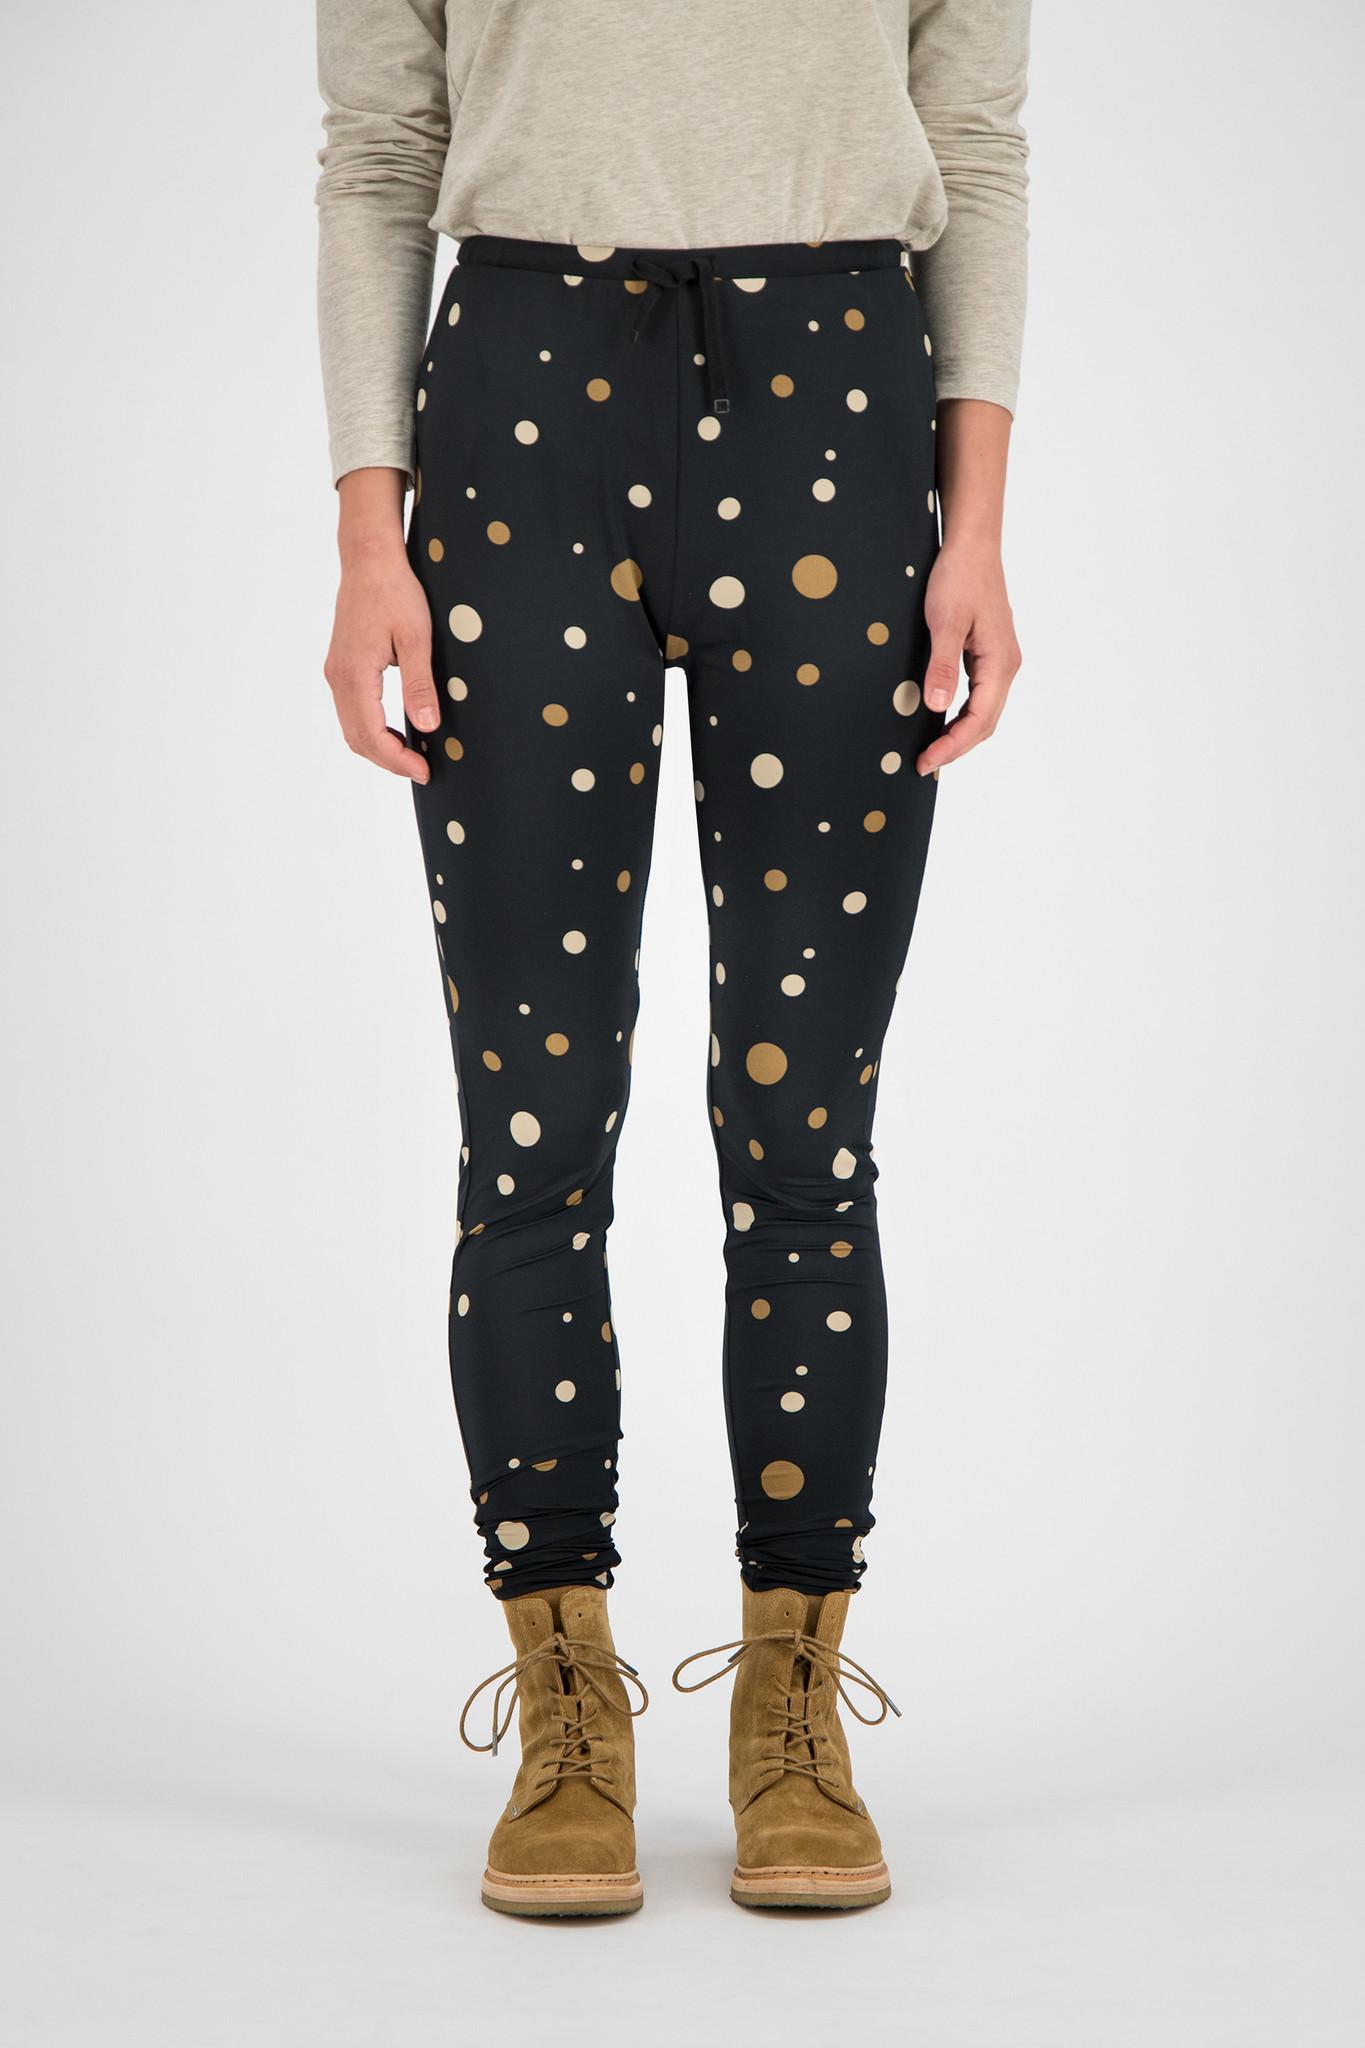 SYLVER Fantasy Dot Pants - Black